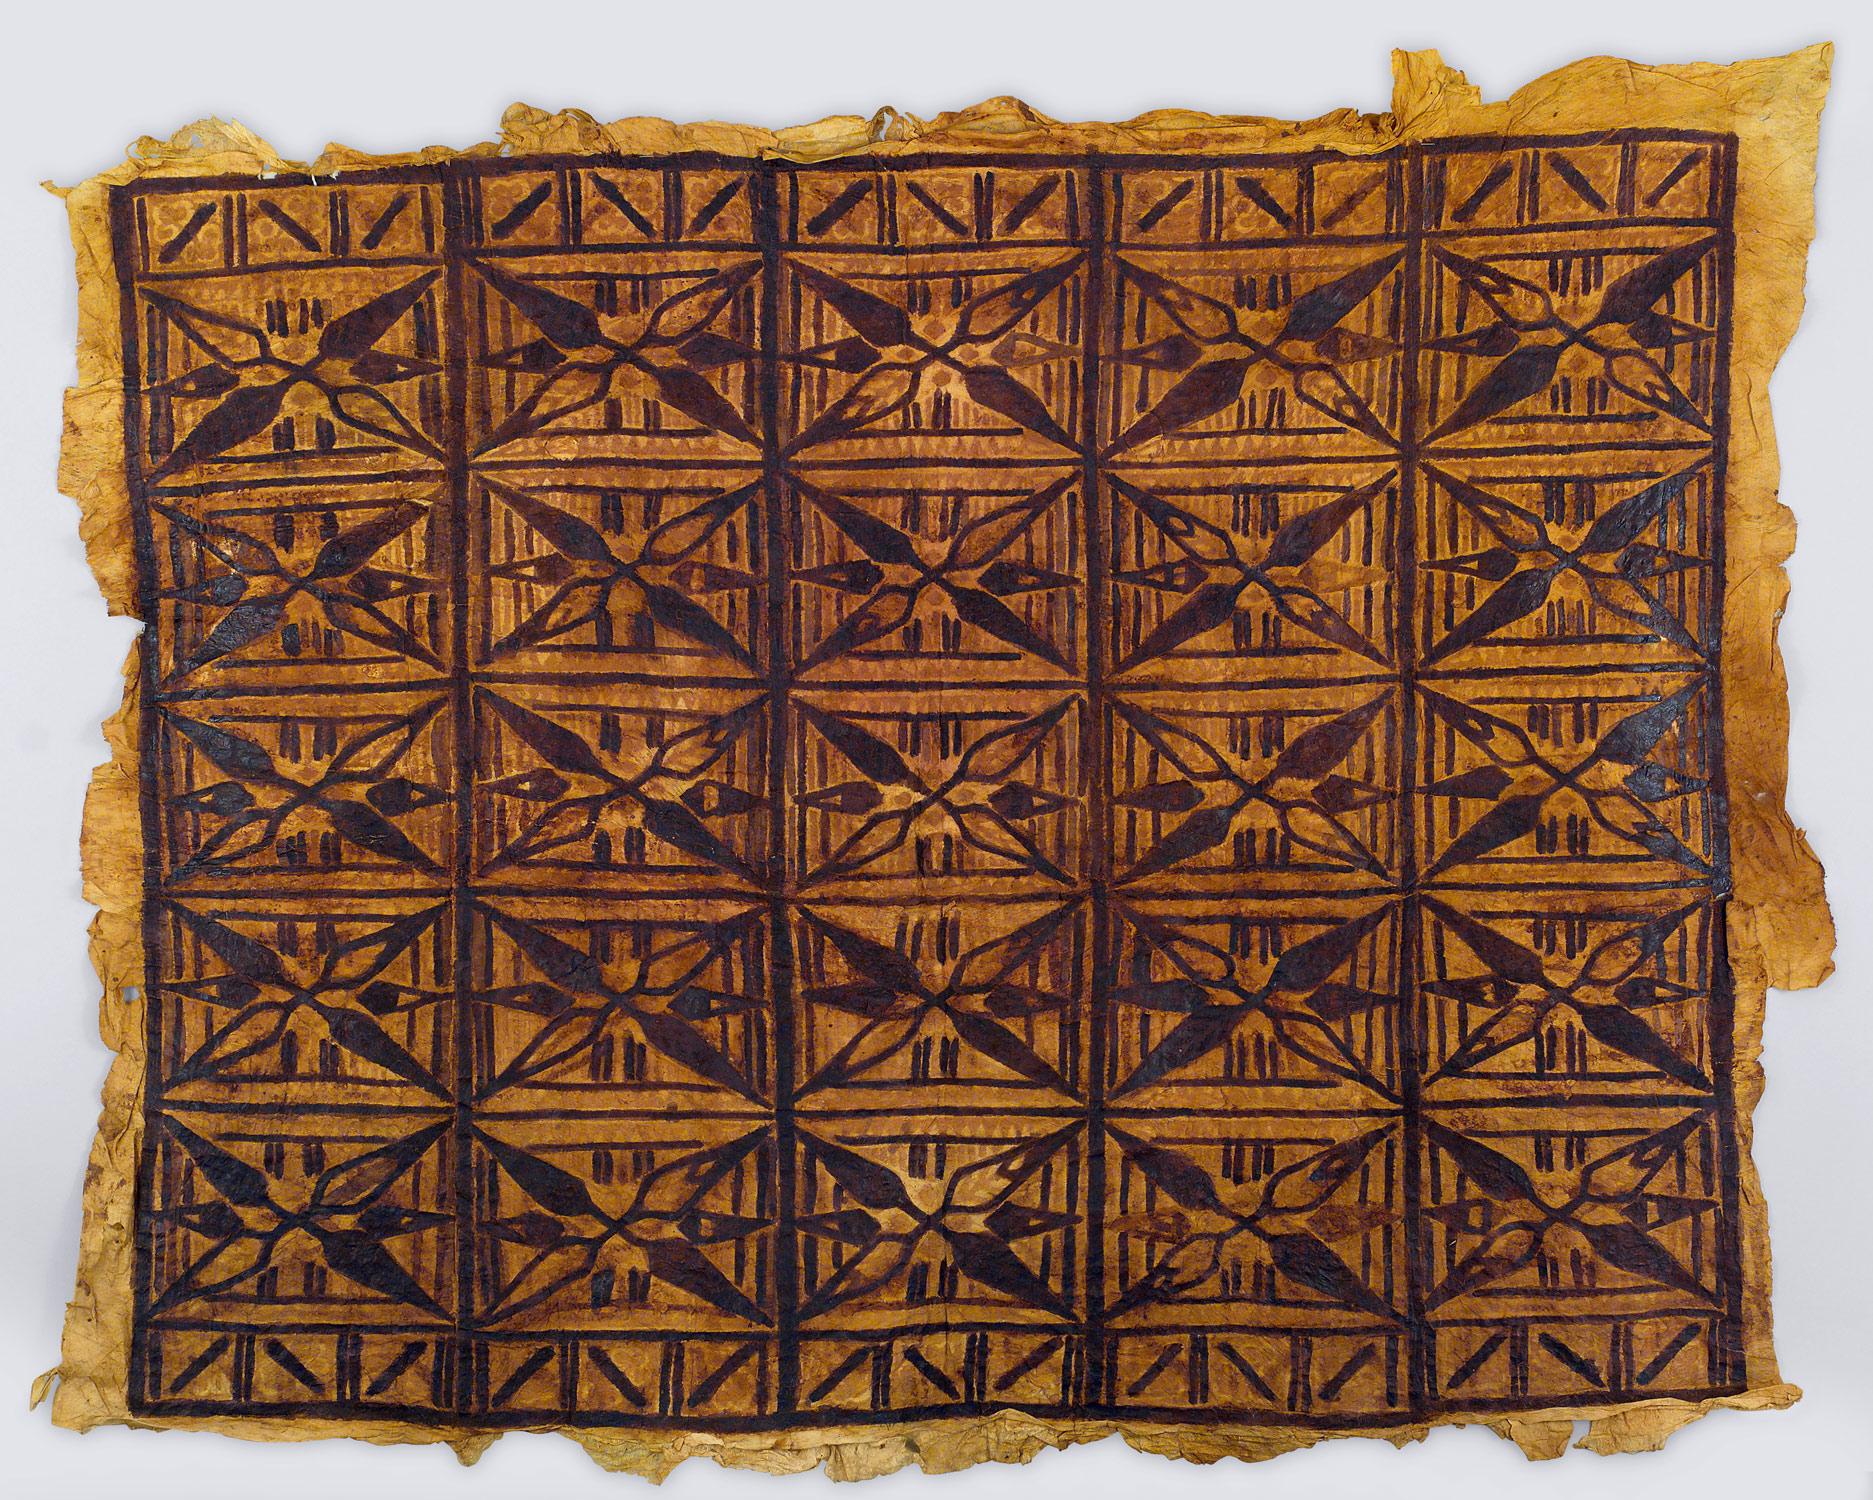 Form Art Term : Barkcloth panel siapo work of art heilbrunn timeline